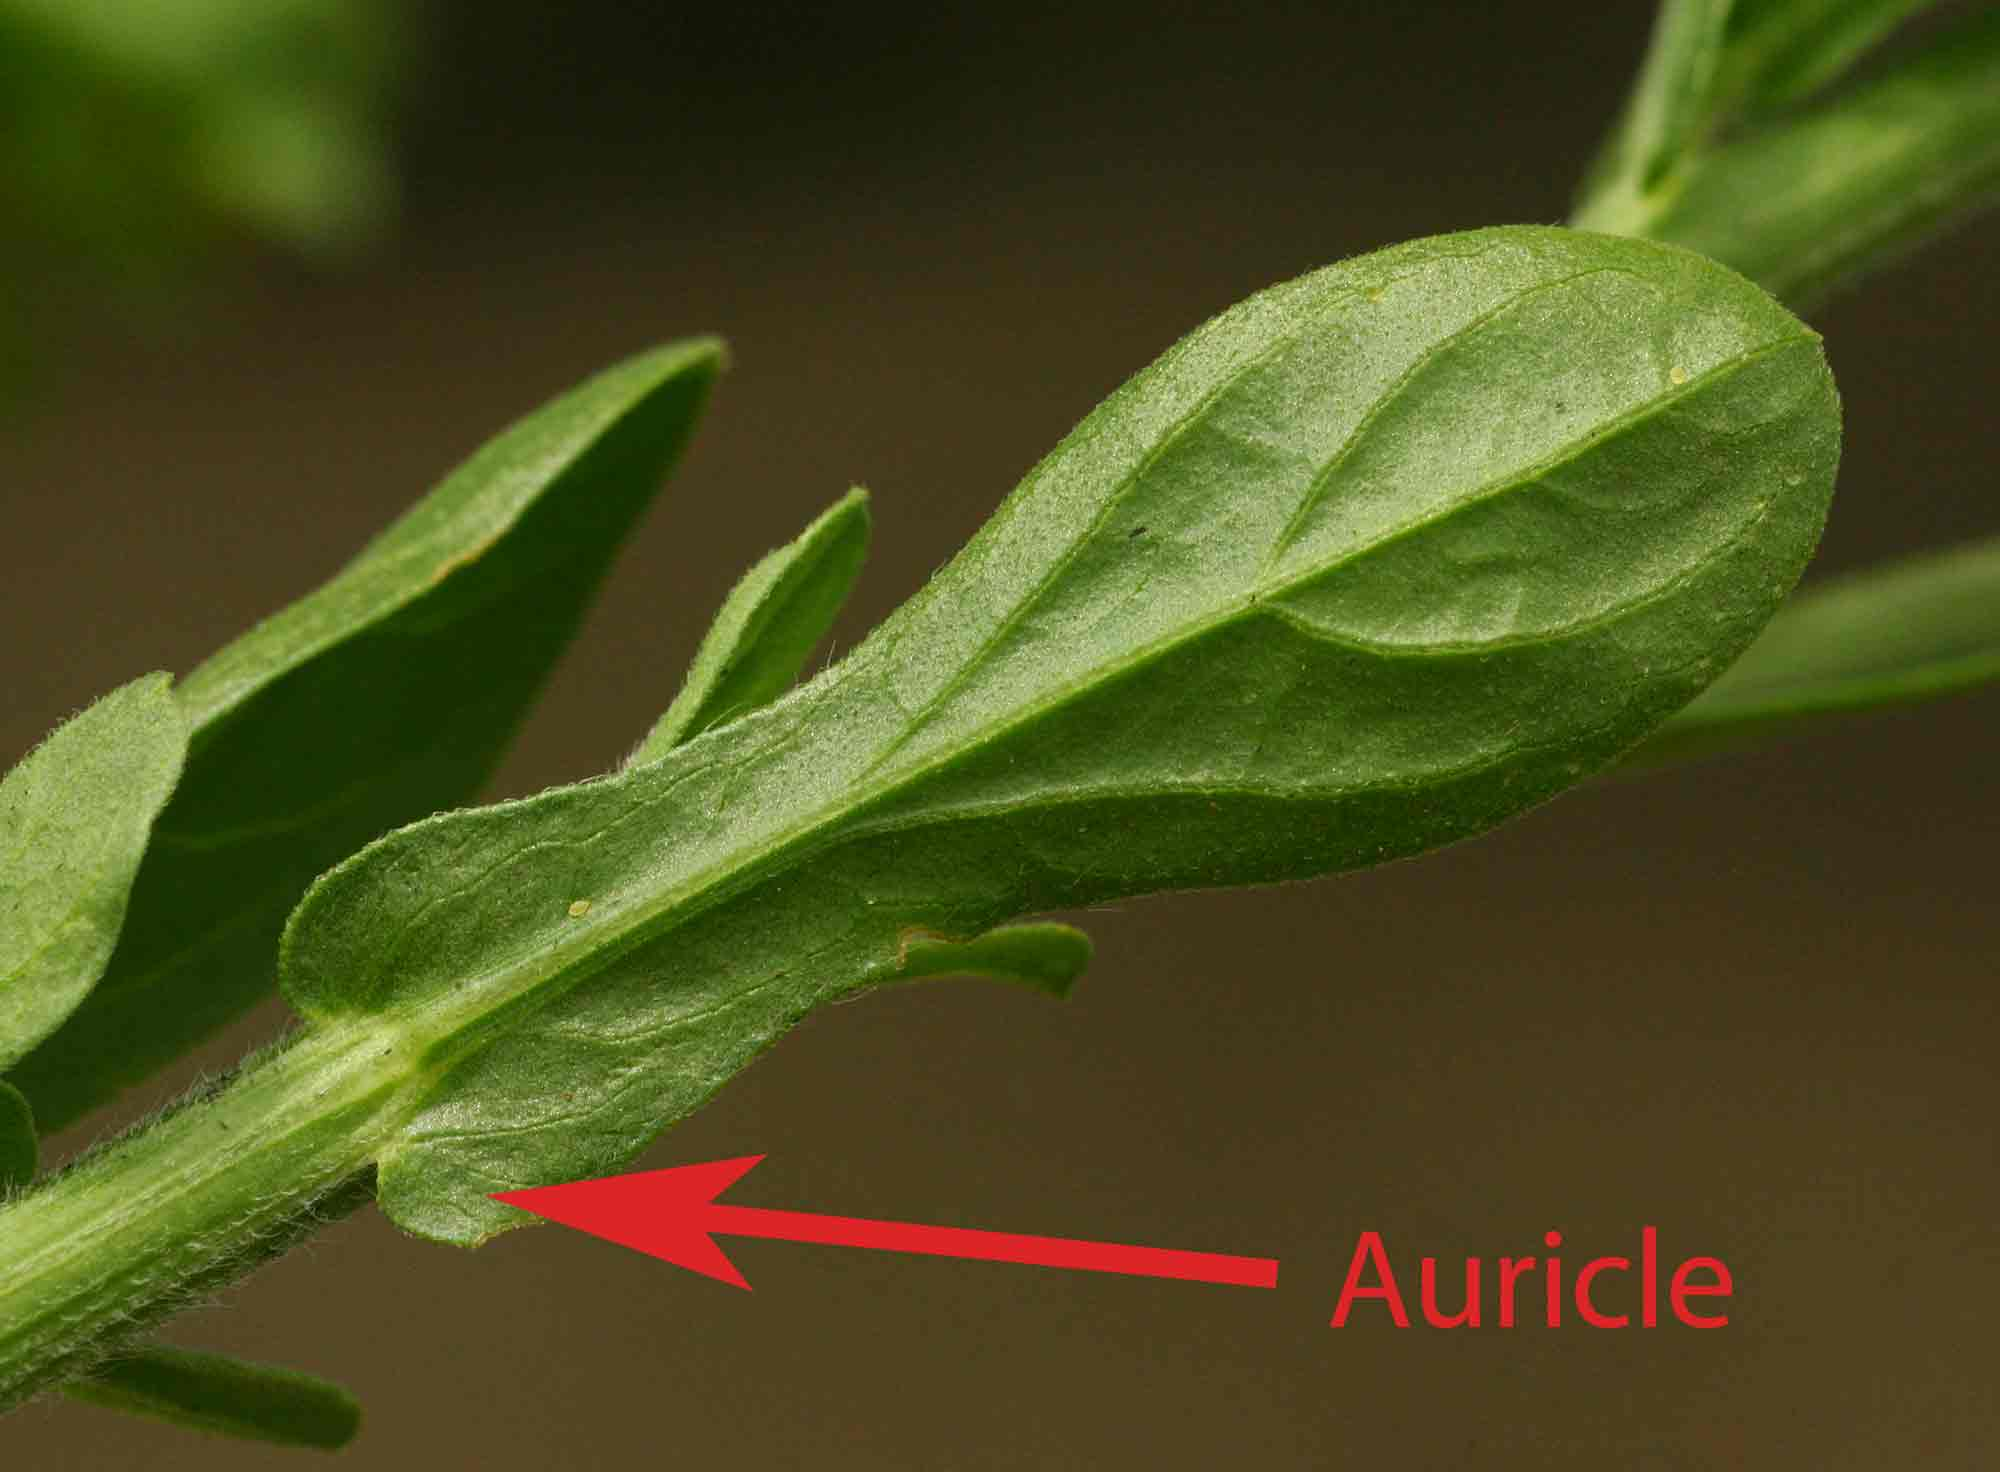 An auricle on Nidorella auriculata.